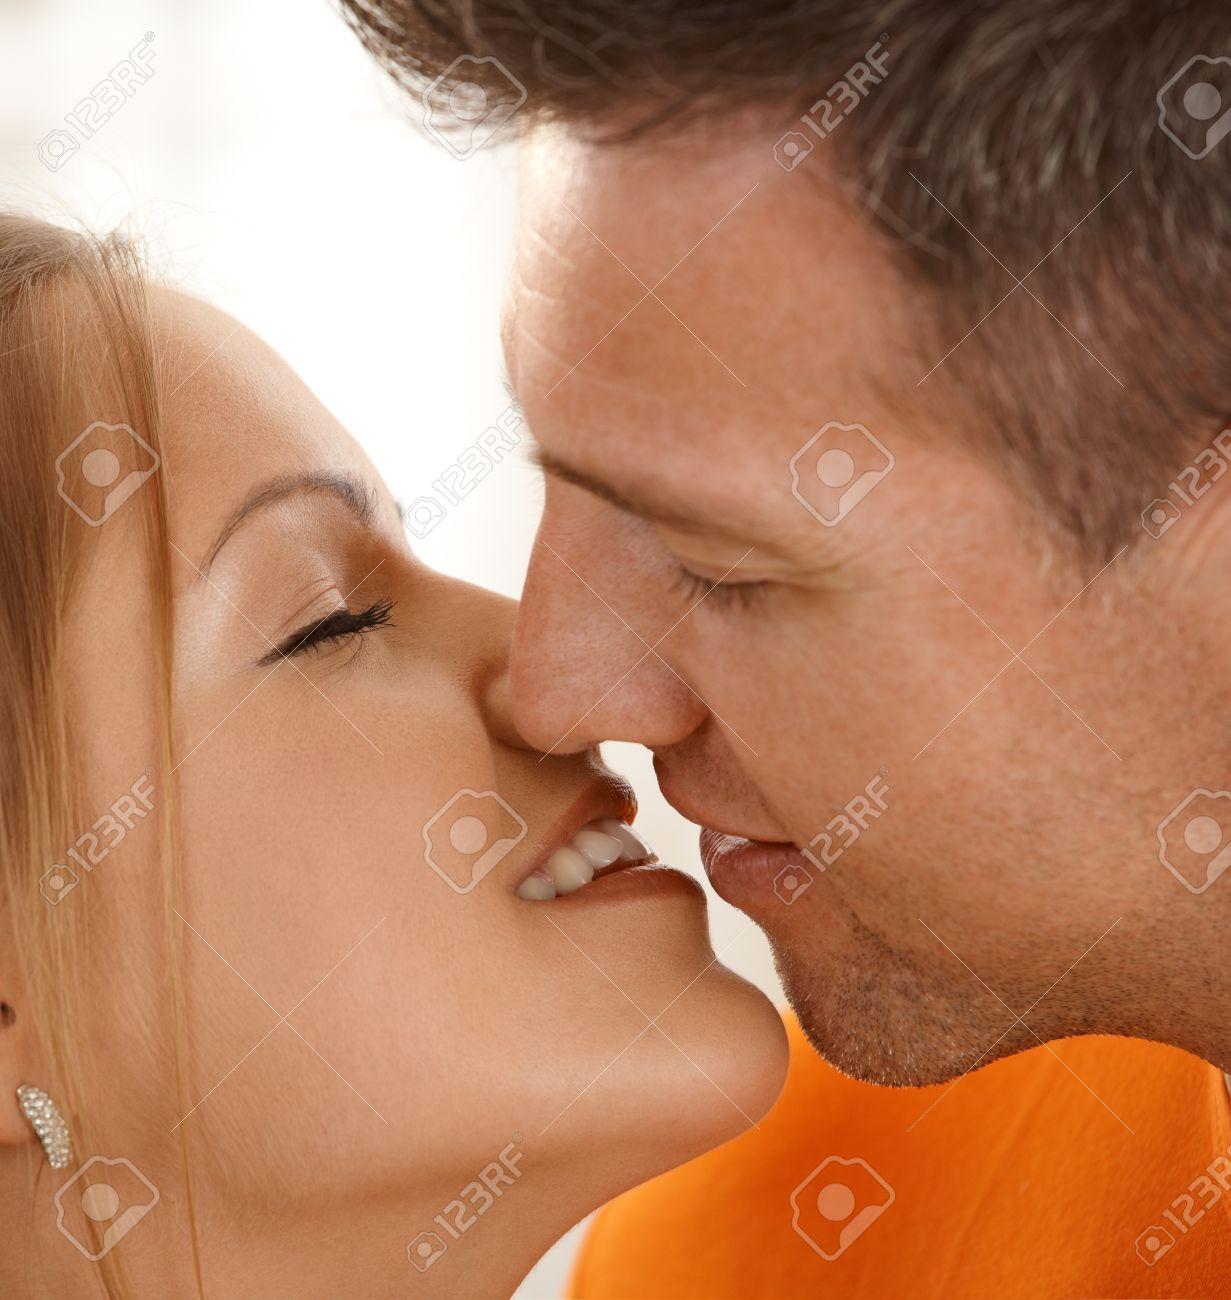 Man kissing smiling woman in closeup, eyes closed. Stock Photo - 8747725